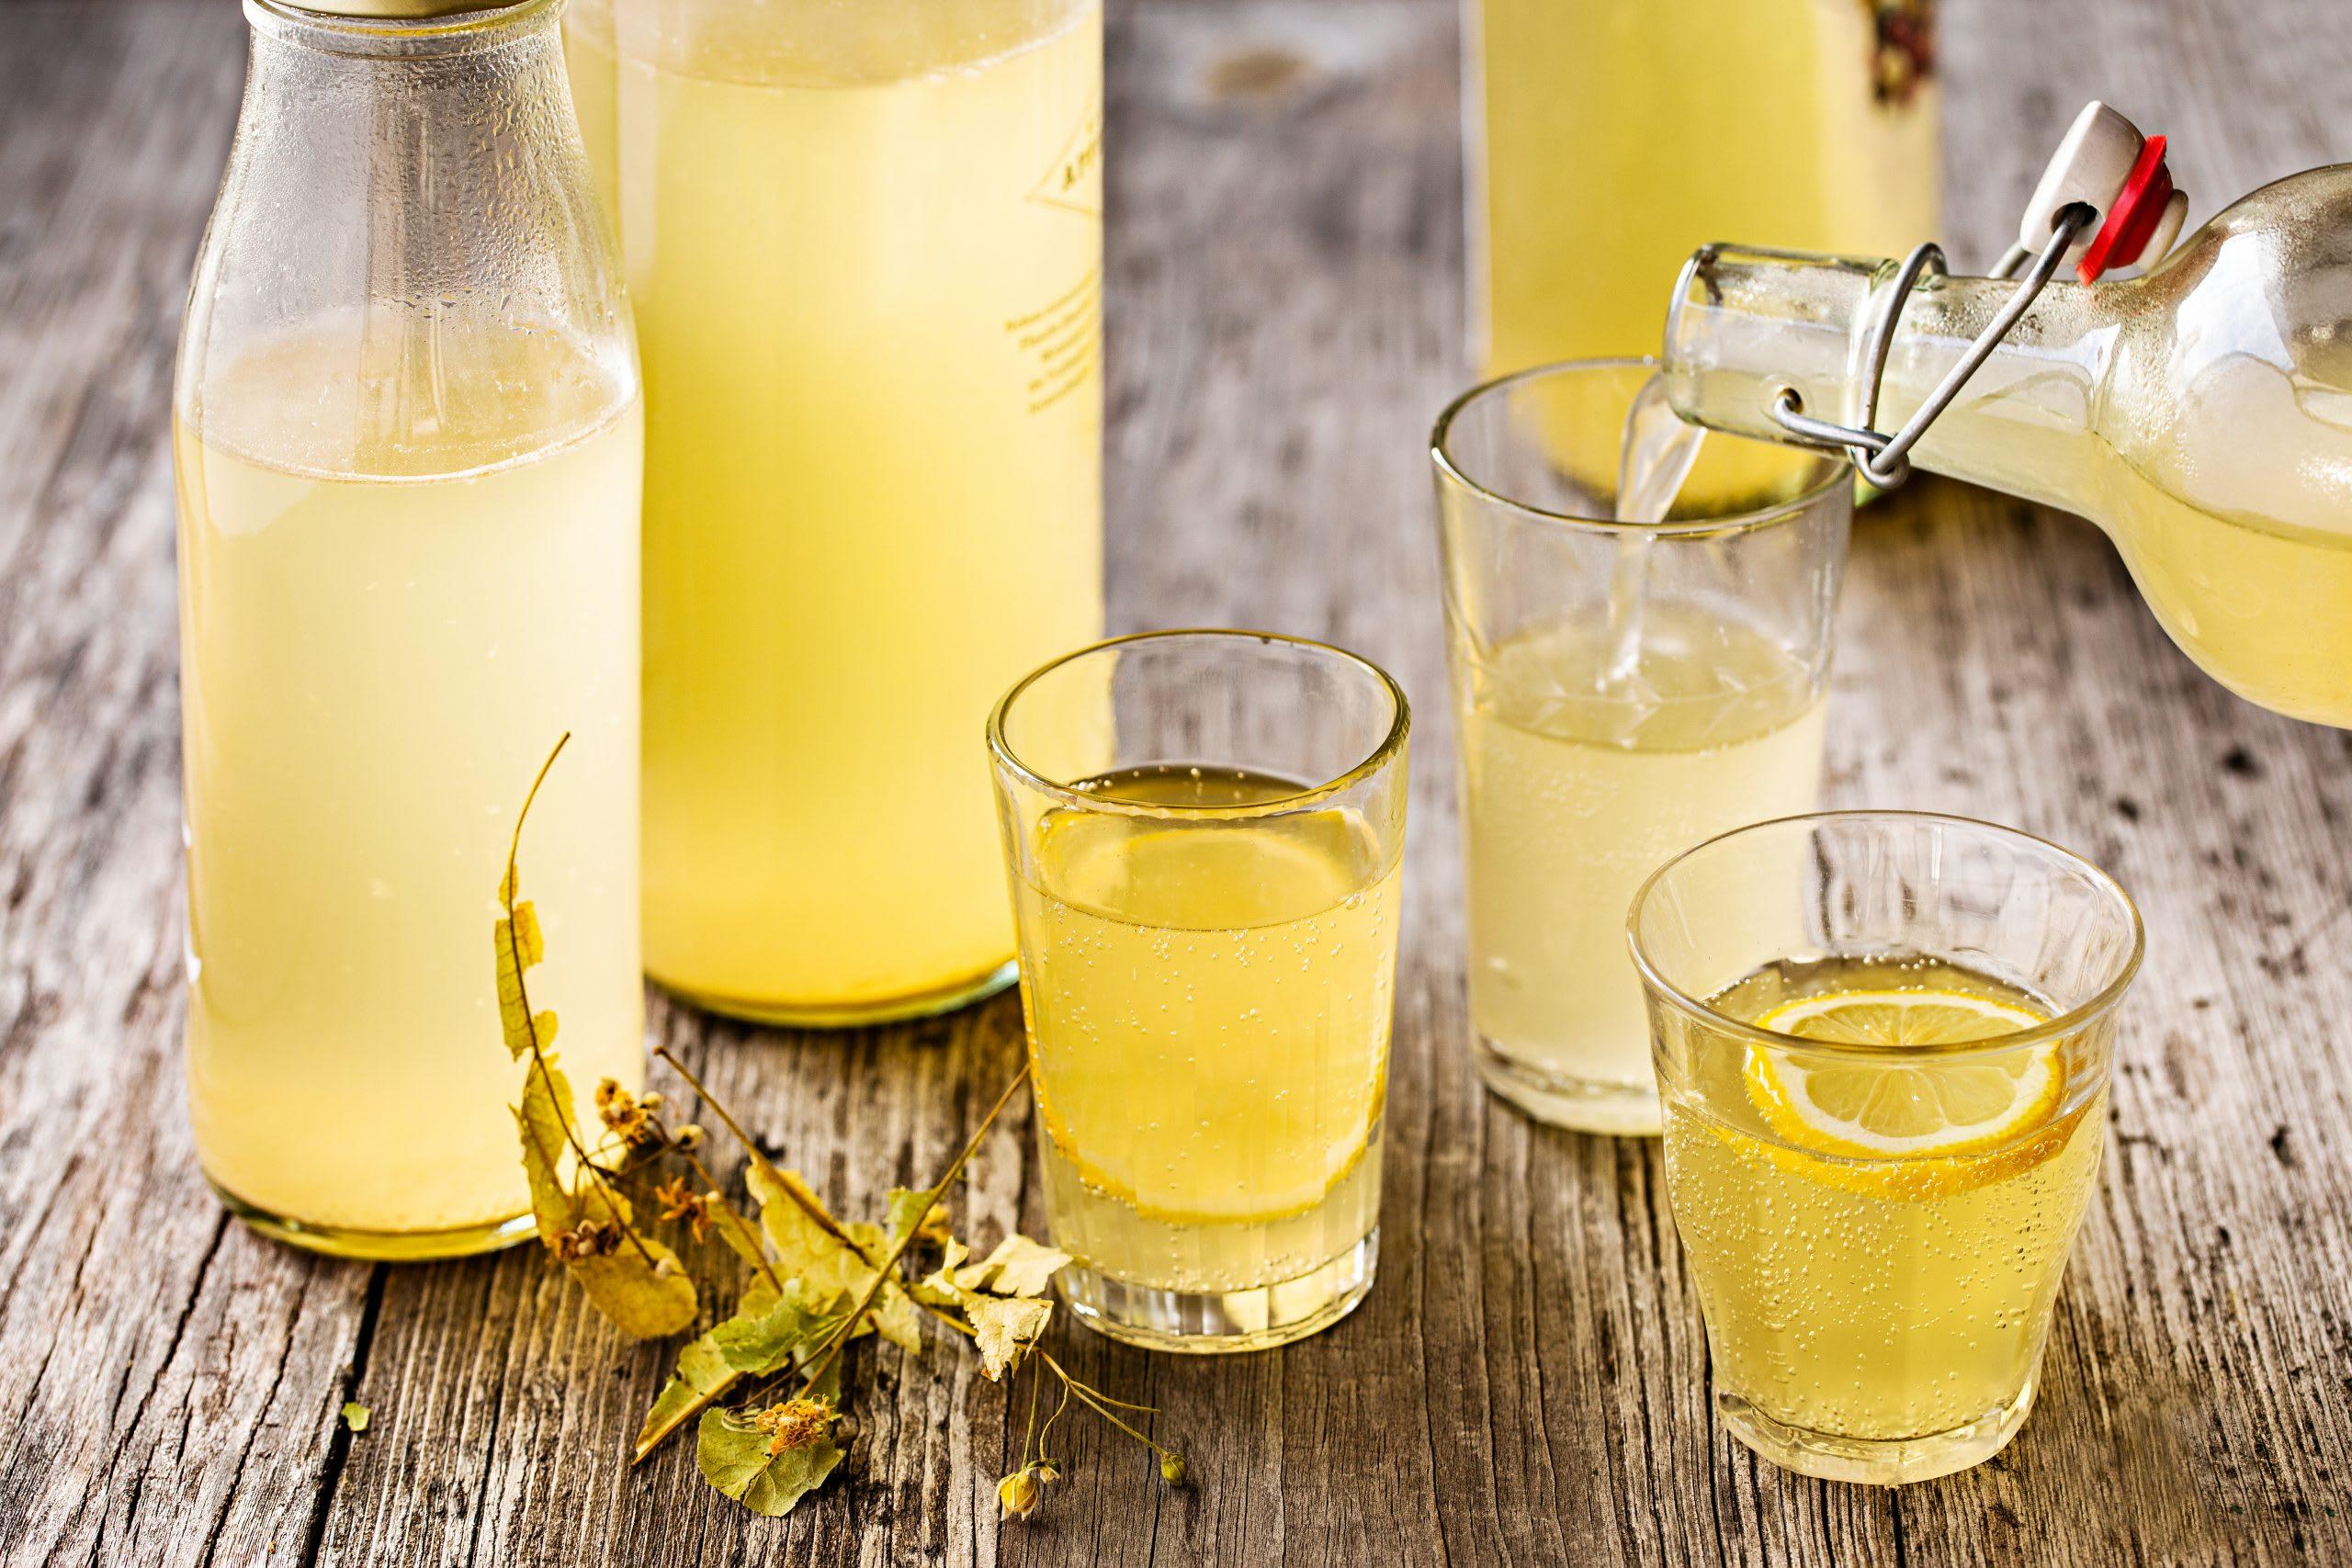 Limonade d'hiver